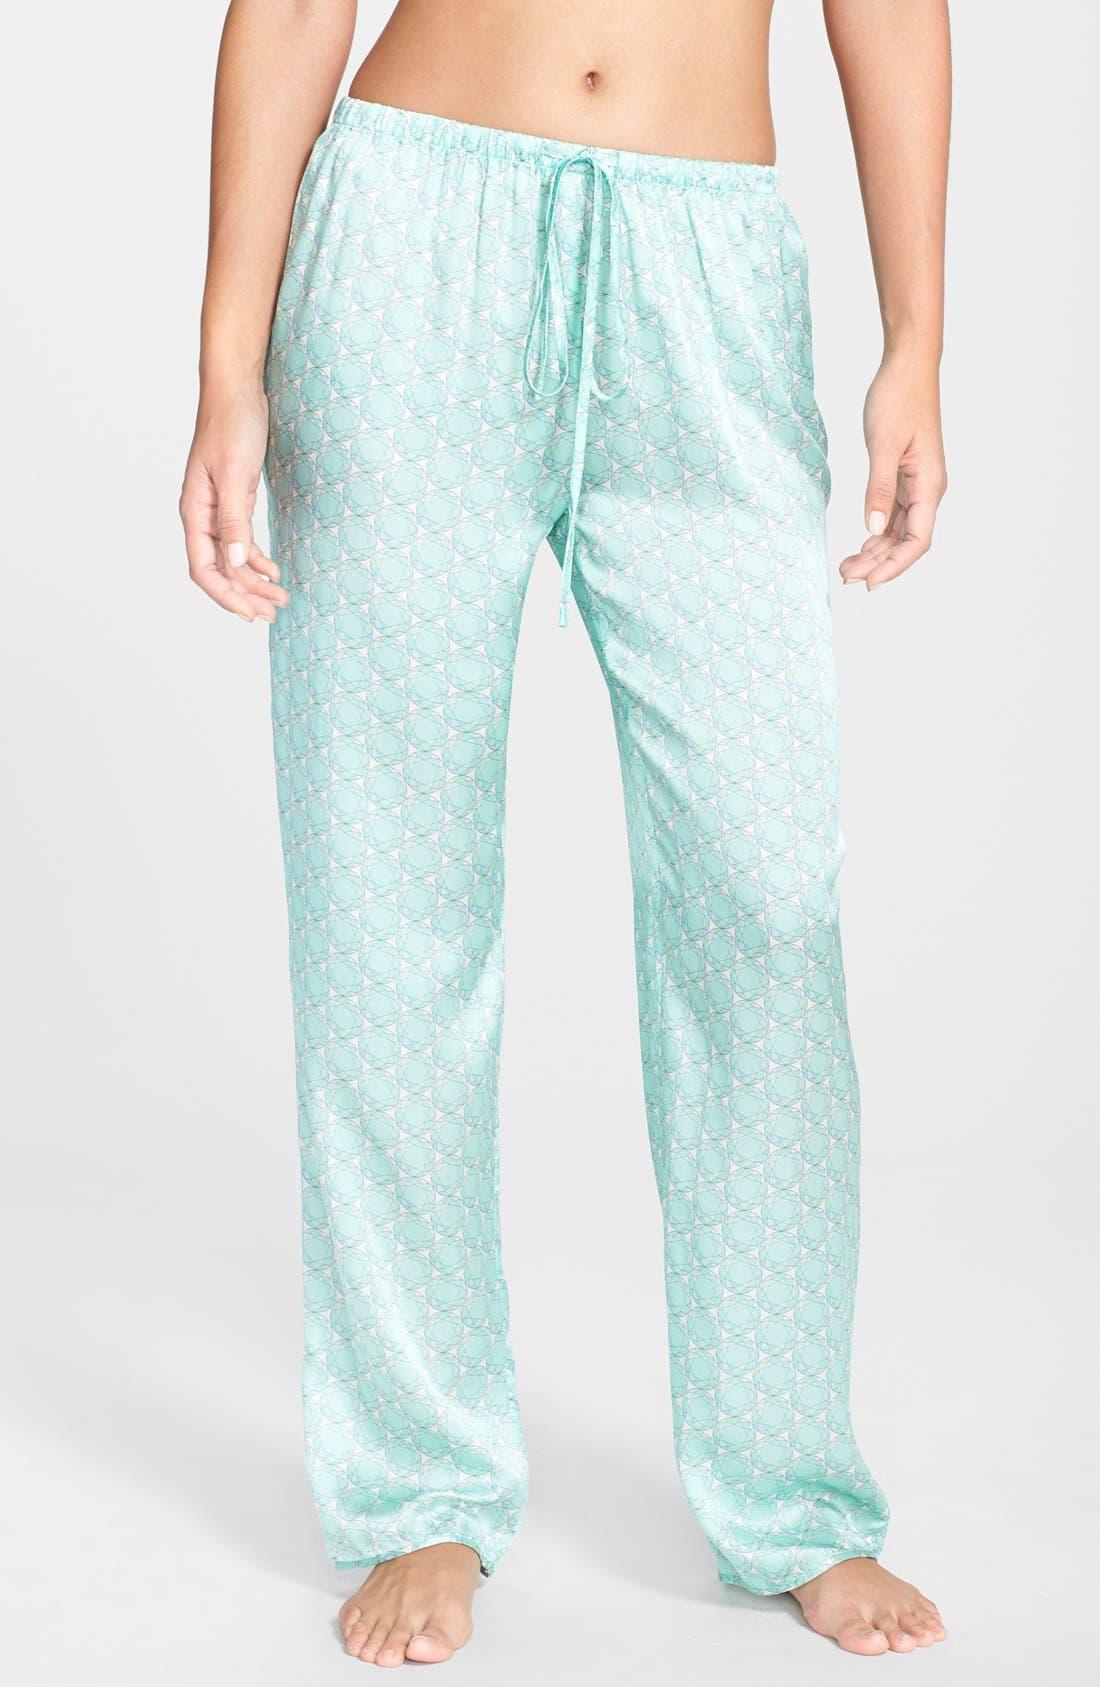 Alternate Image 1 Selected - Beautiful Bottoms London 'Panama' Satin Pajama Pants